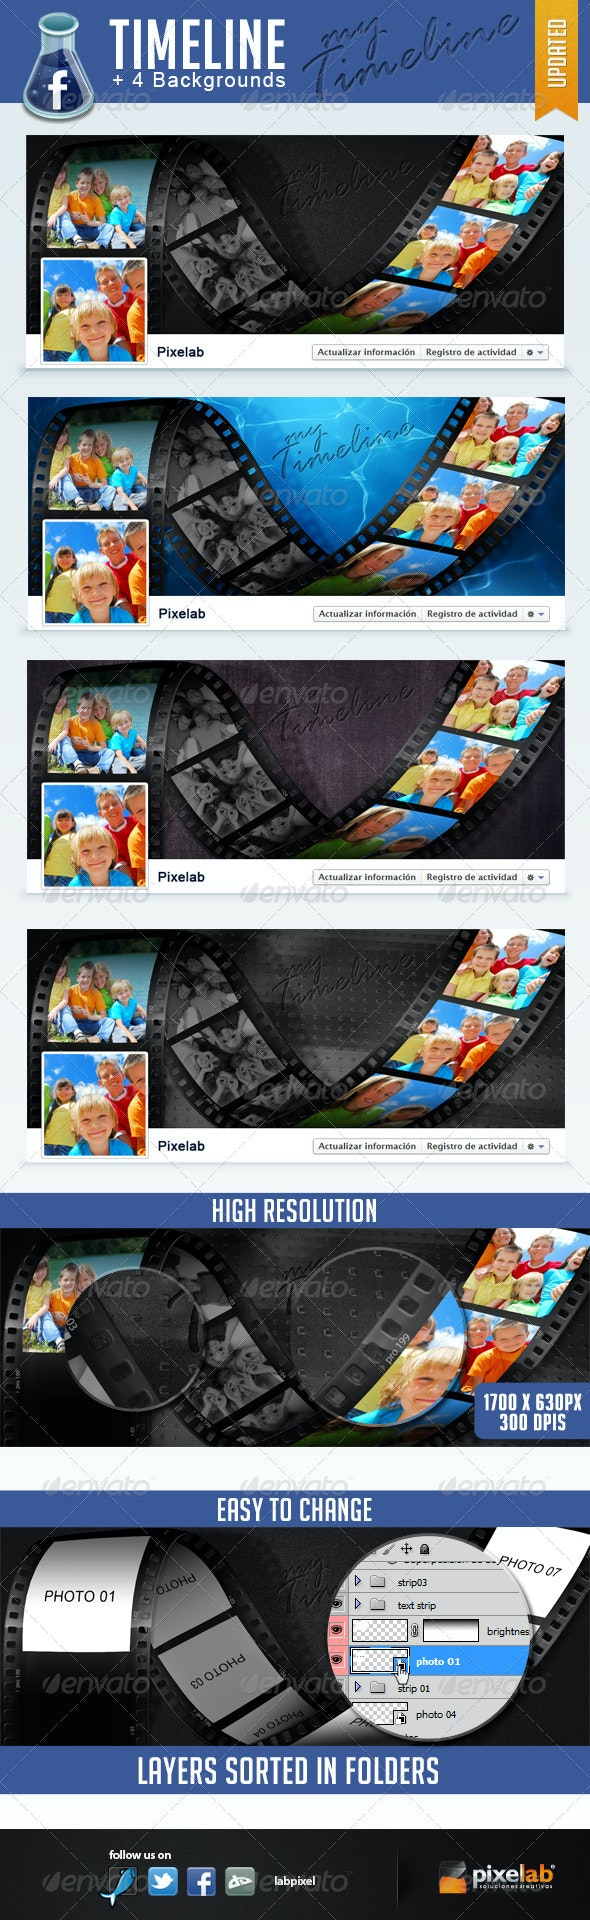 Fb Timeline camera photos - Facebook Timeline Covers Social Media